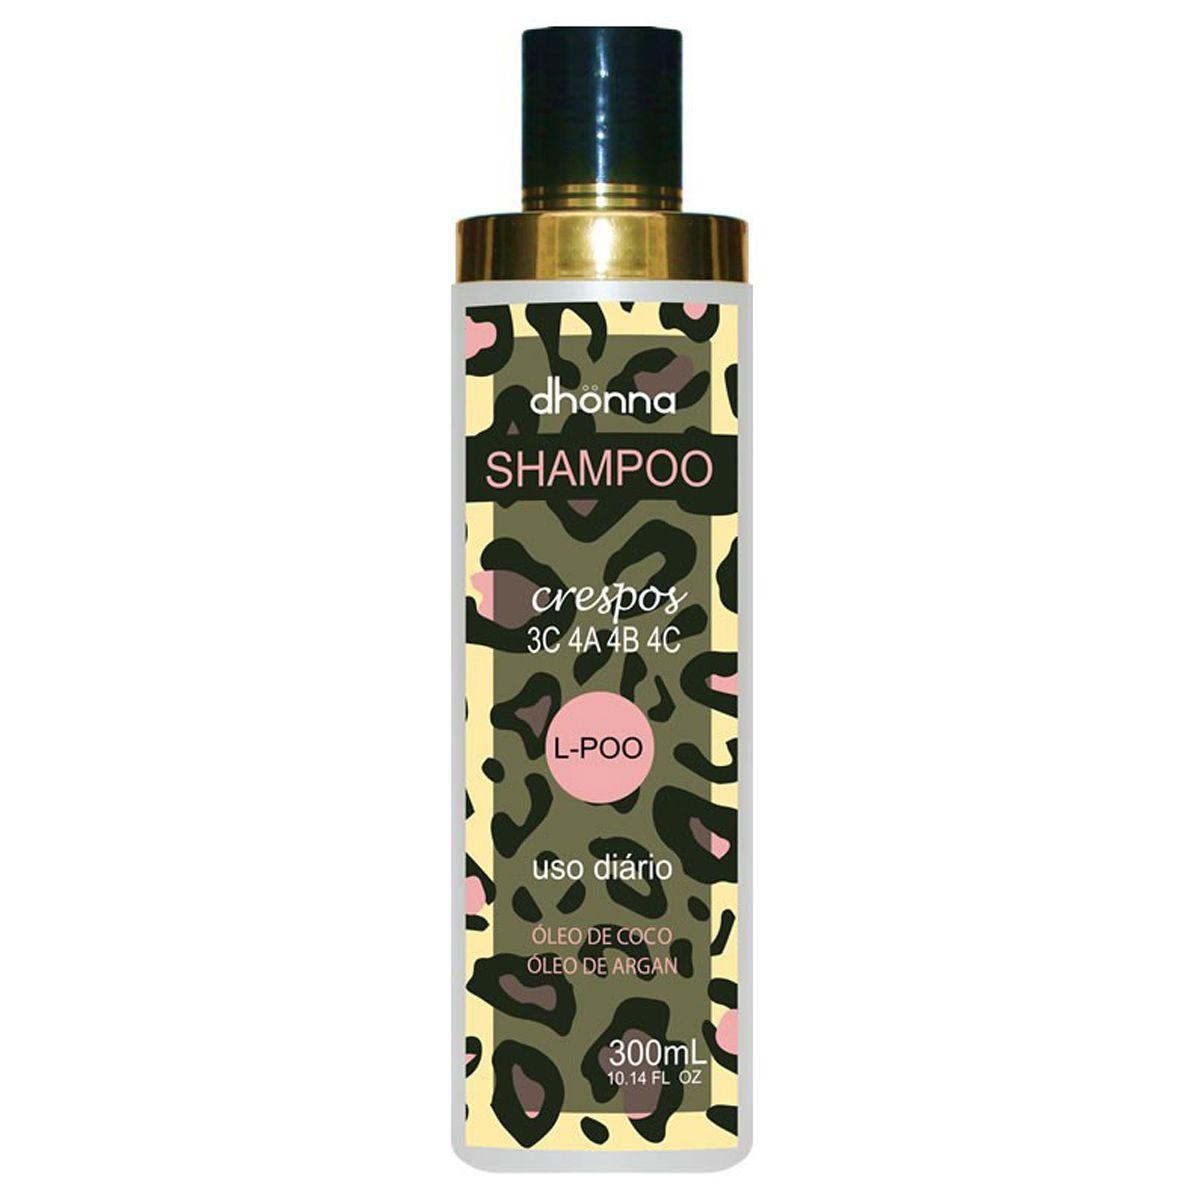 Dhonna - Shampoo L-Poo - Crespos - 300ml